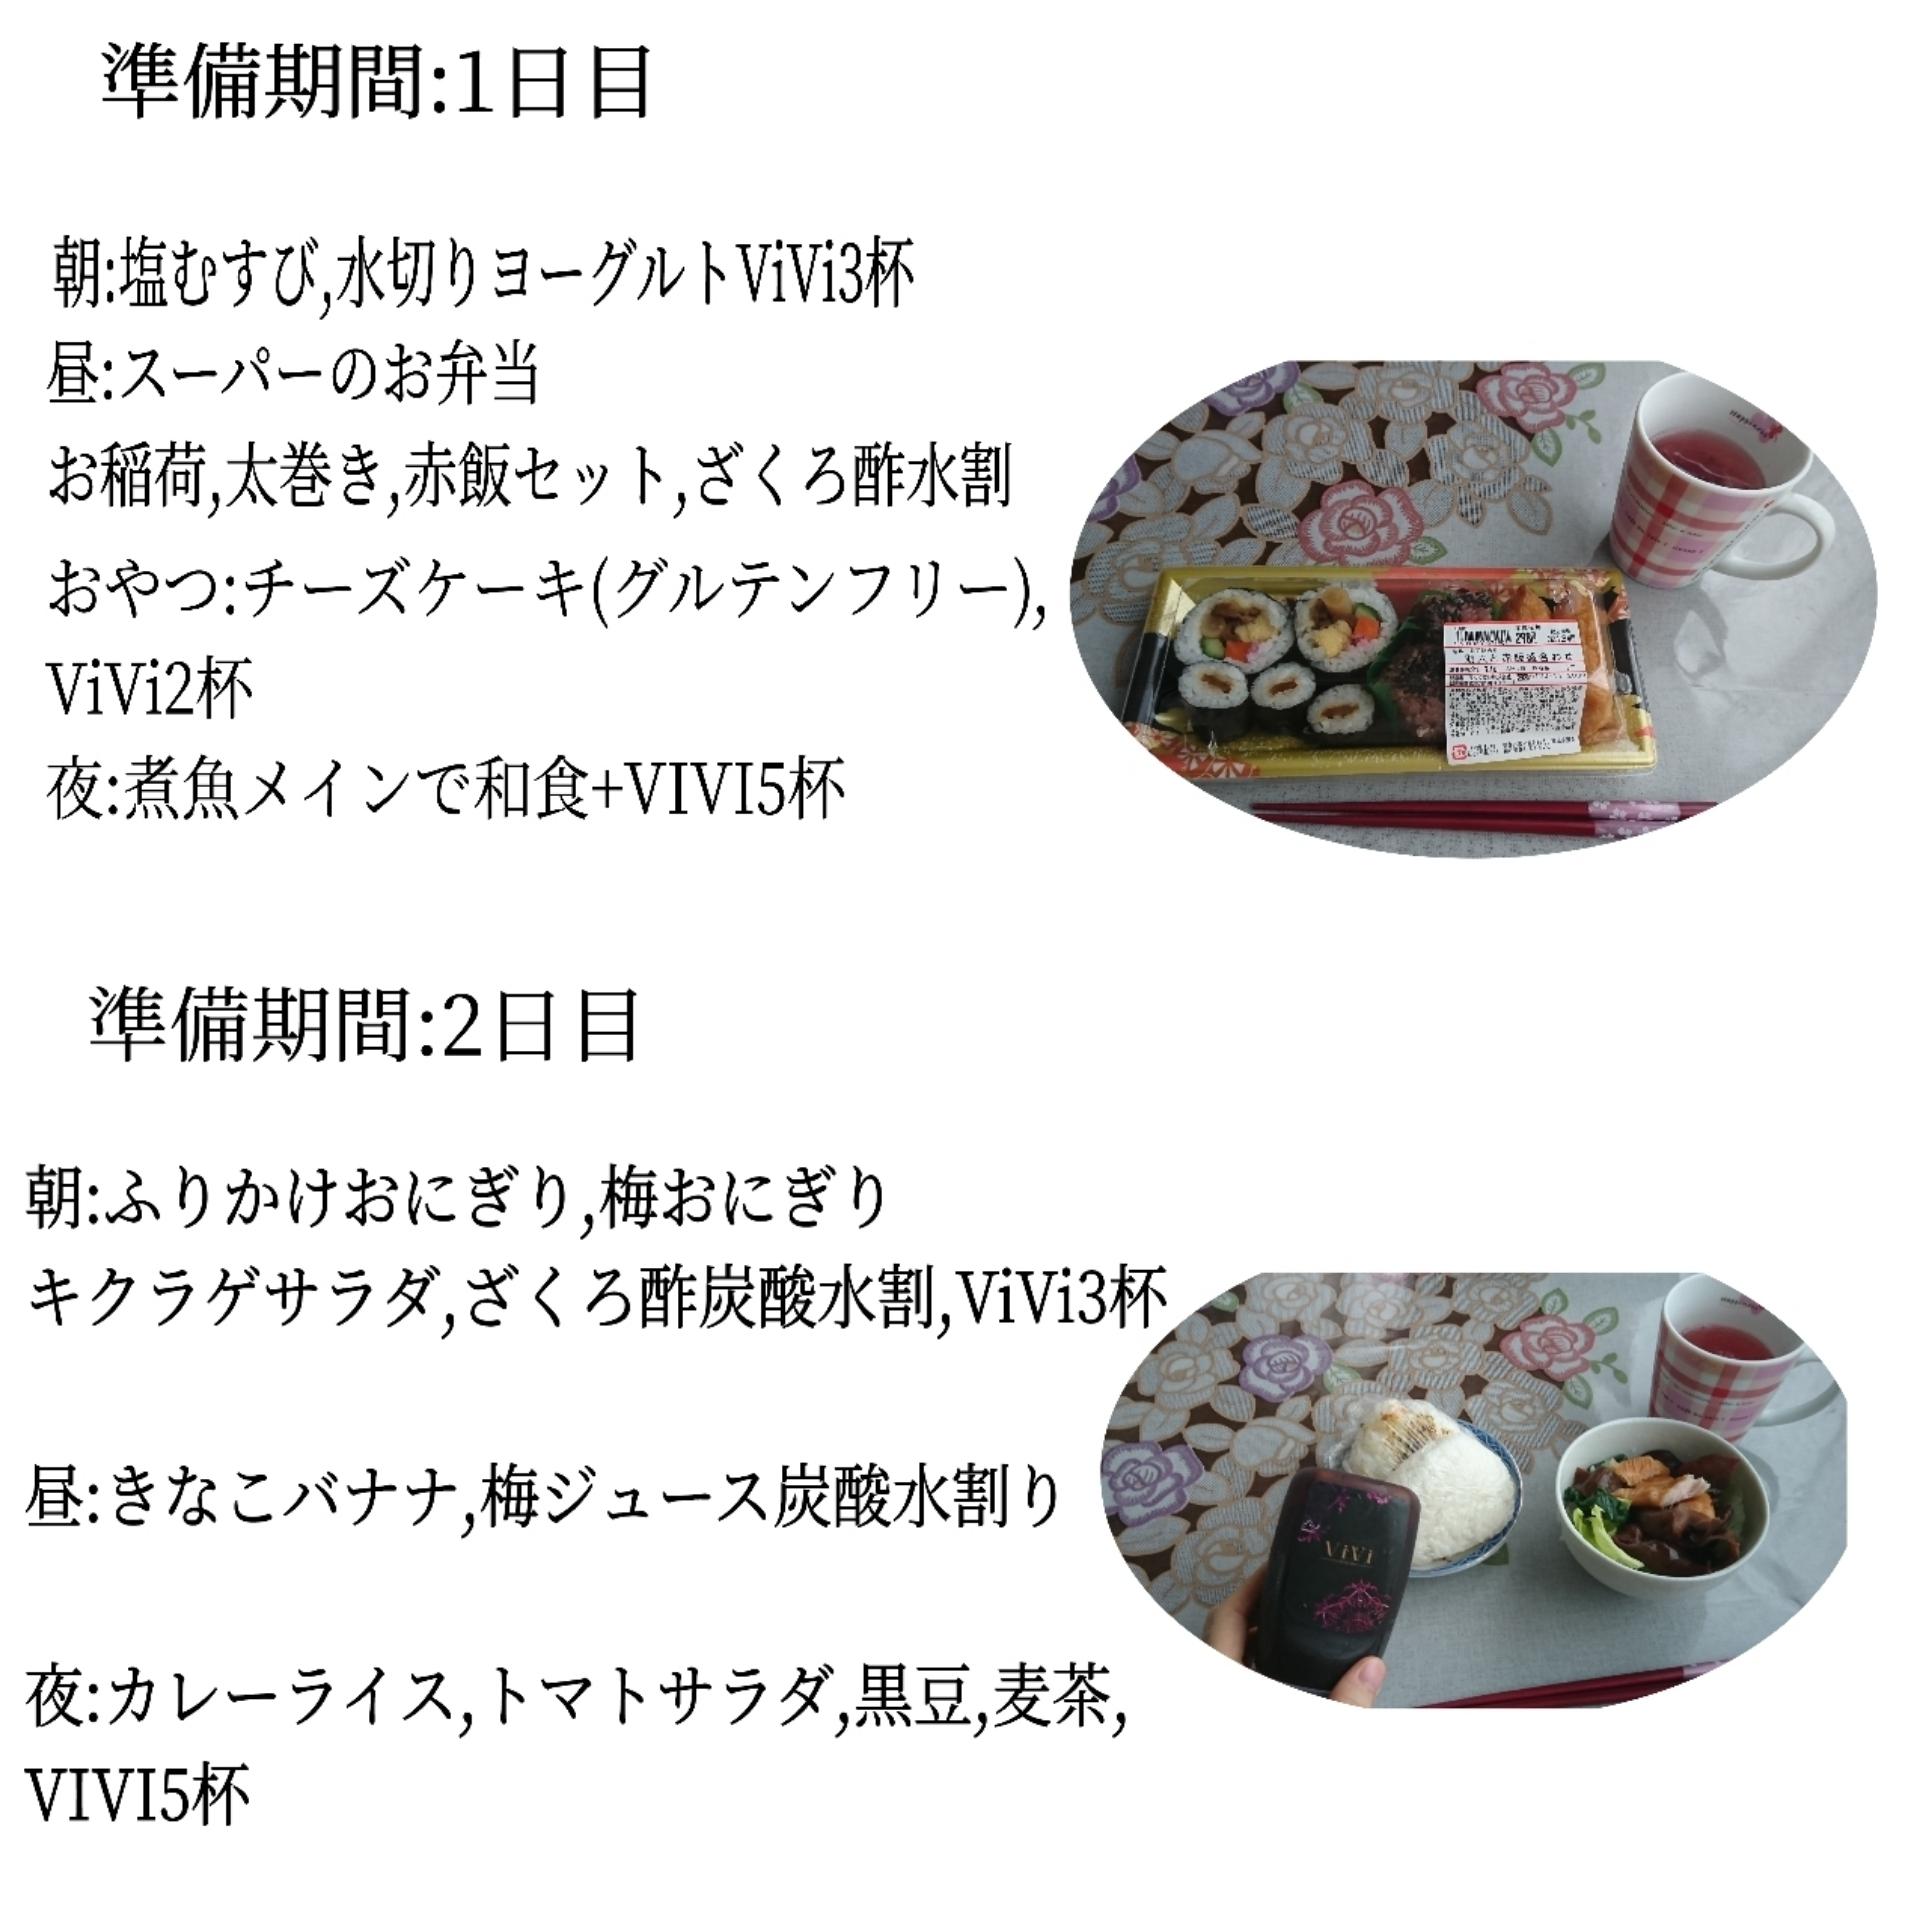 Salon de NOEL(サロン・ド ノエル)植物発酵エキス ViViを使ったYuKaRi♡さんのクチコミ画像5